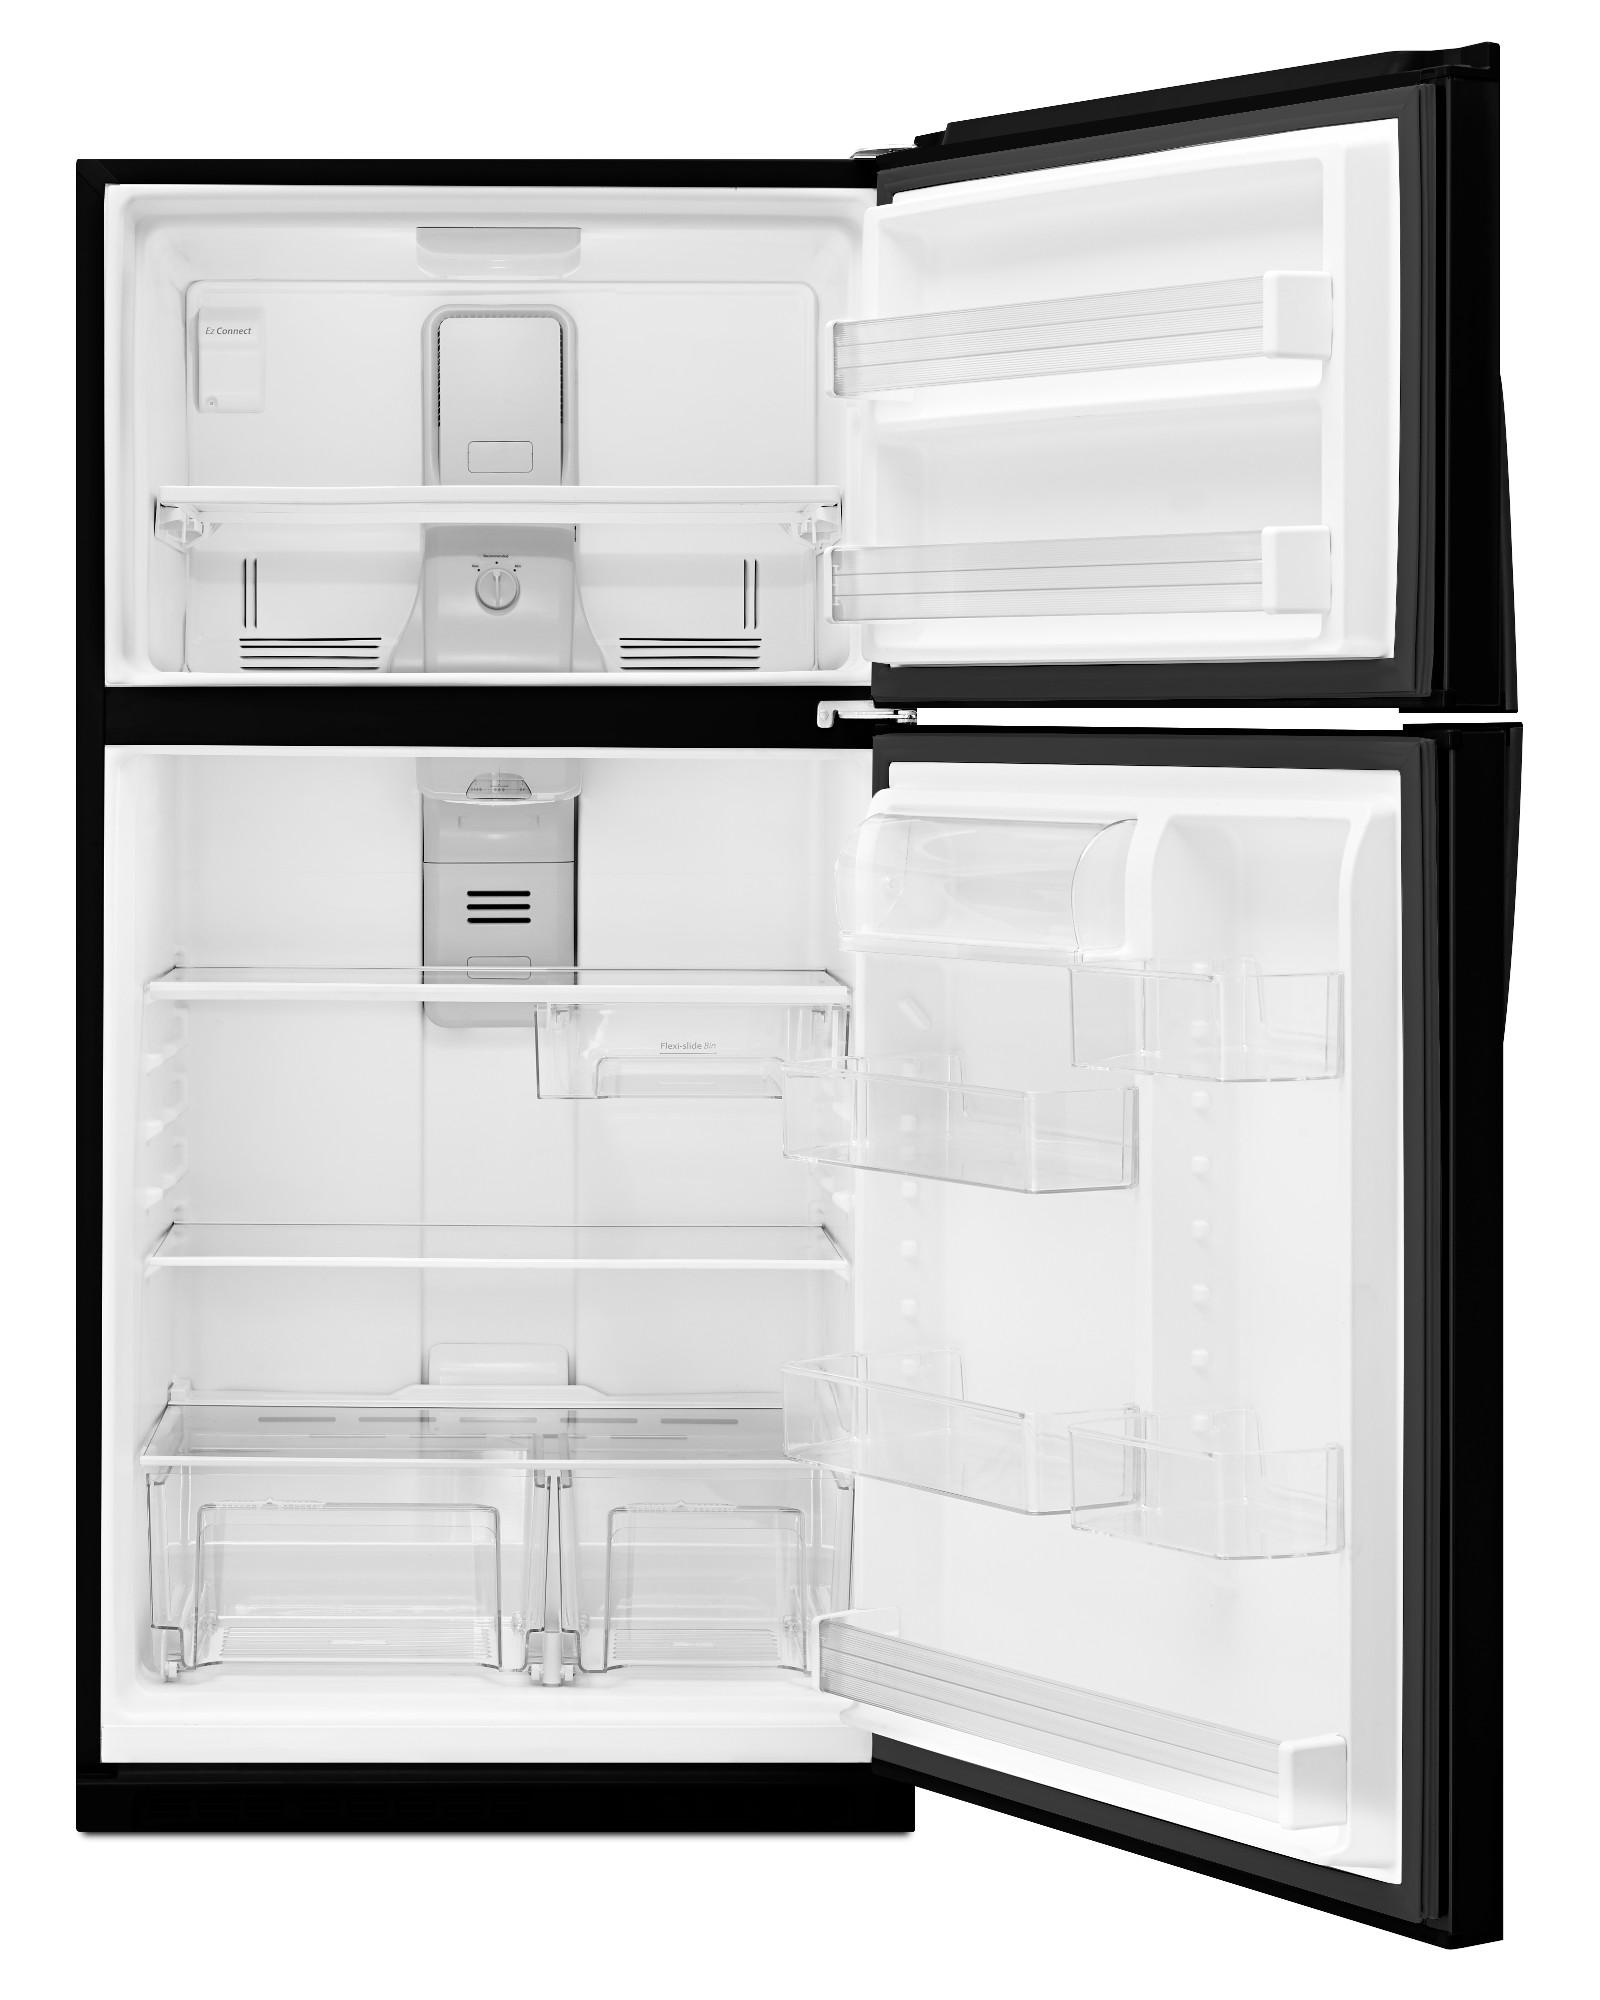 Whirlpool WRT541SZDB 21 ct. ft. Top Freezer Refrigerator - Black